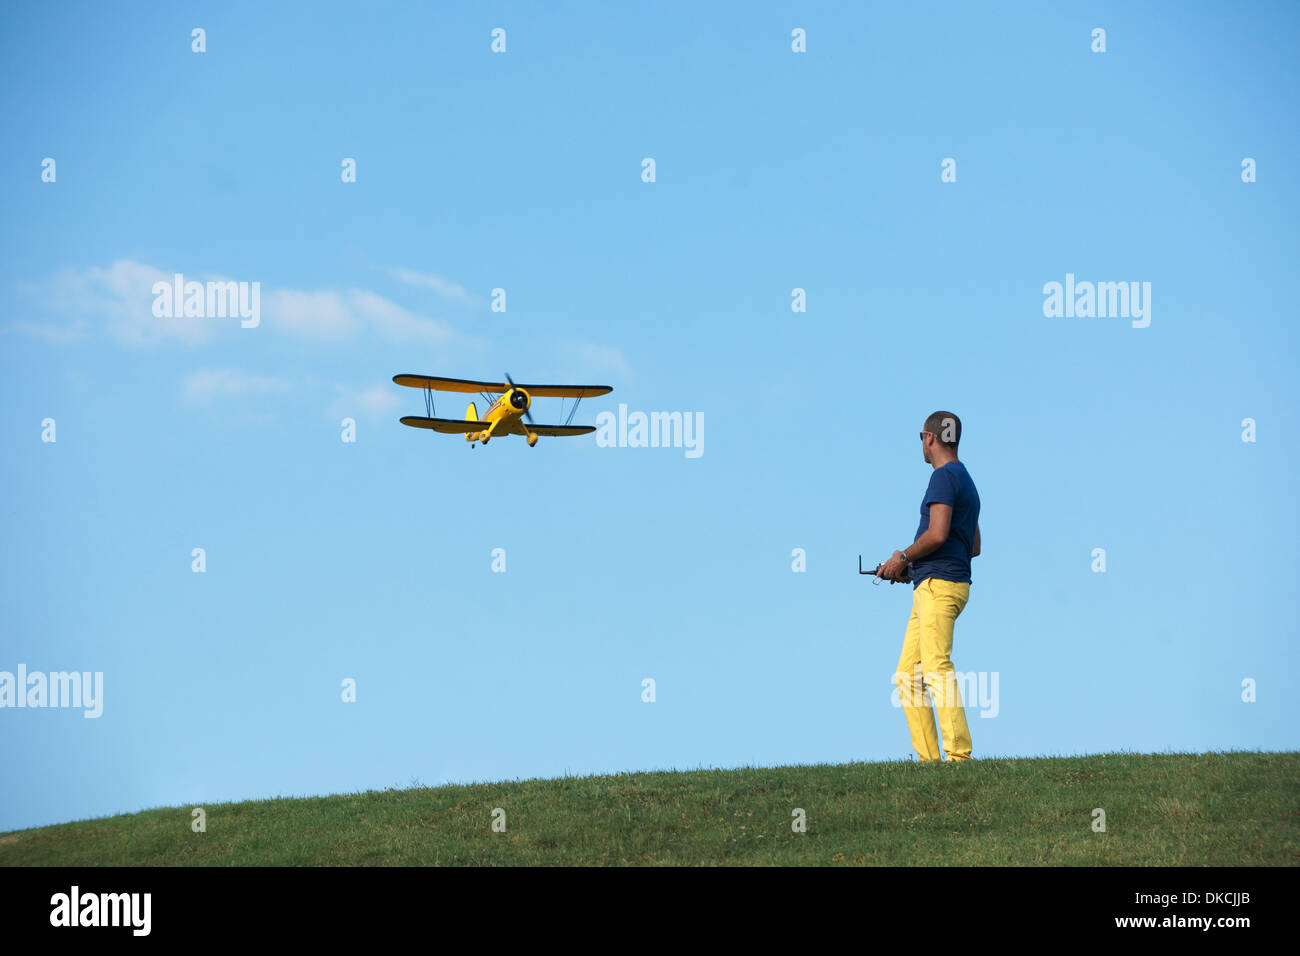 Mann fliegendes Modellflugzeug Stockbild